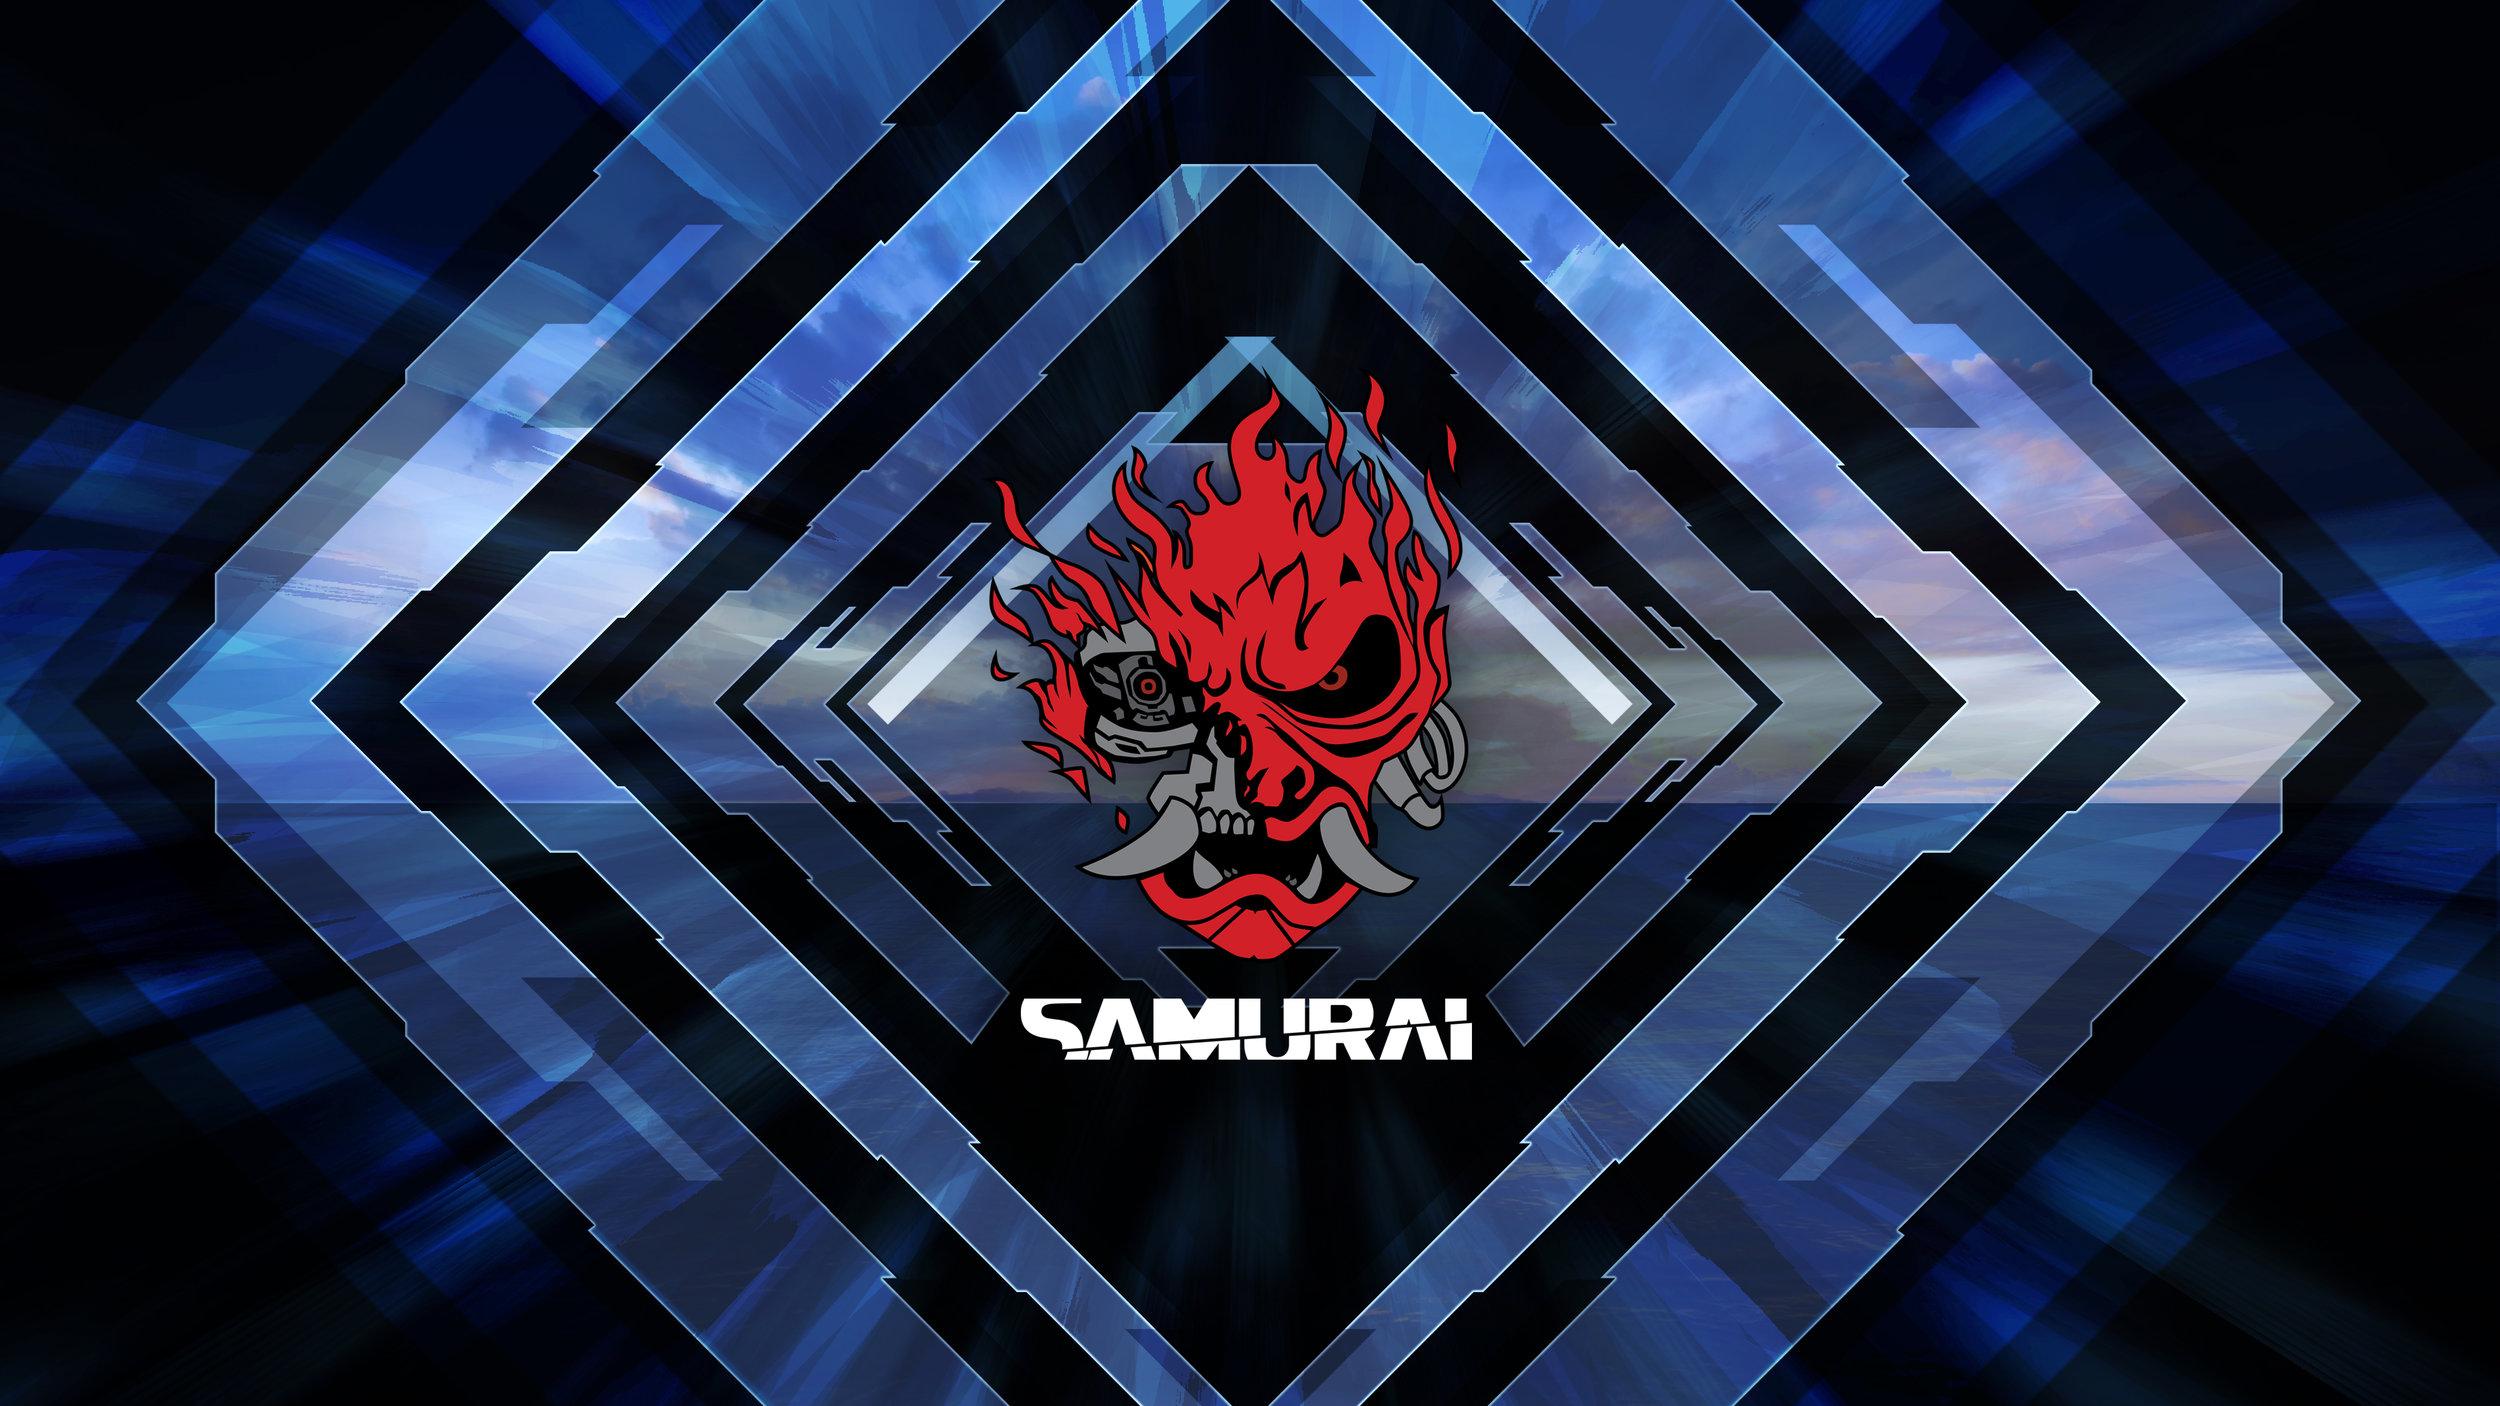 Samurai 4K Walllpaper